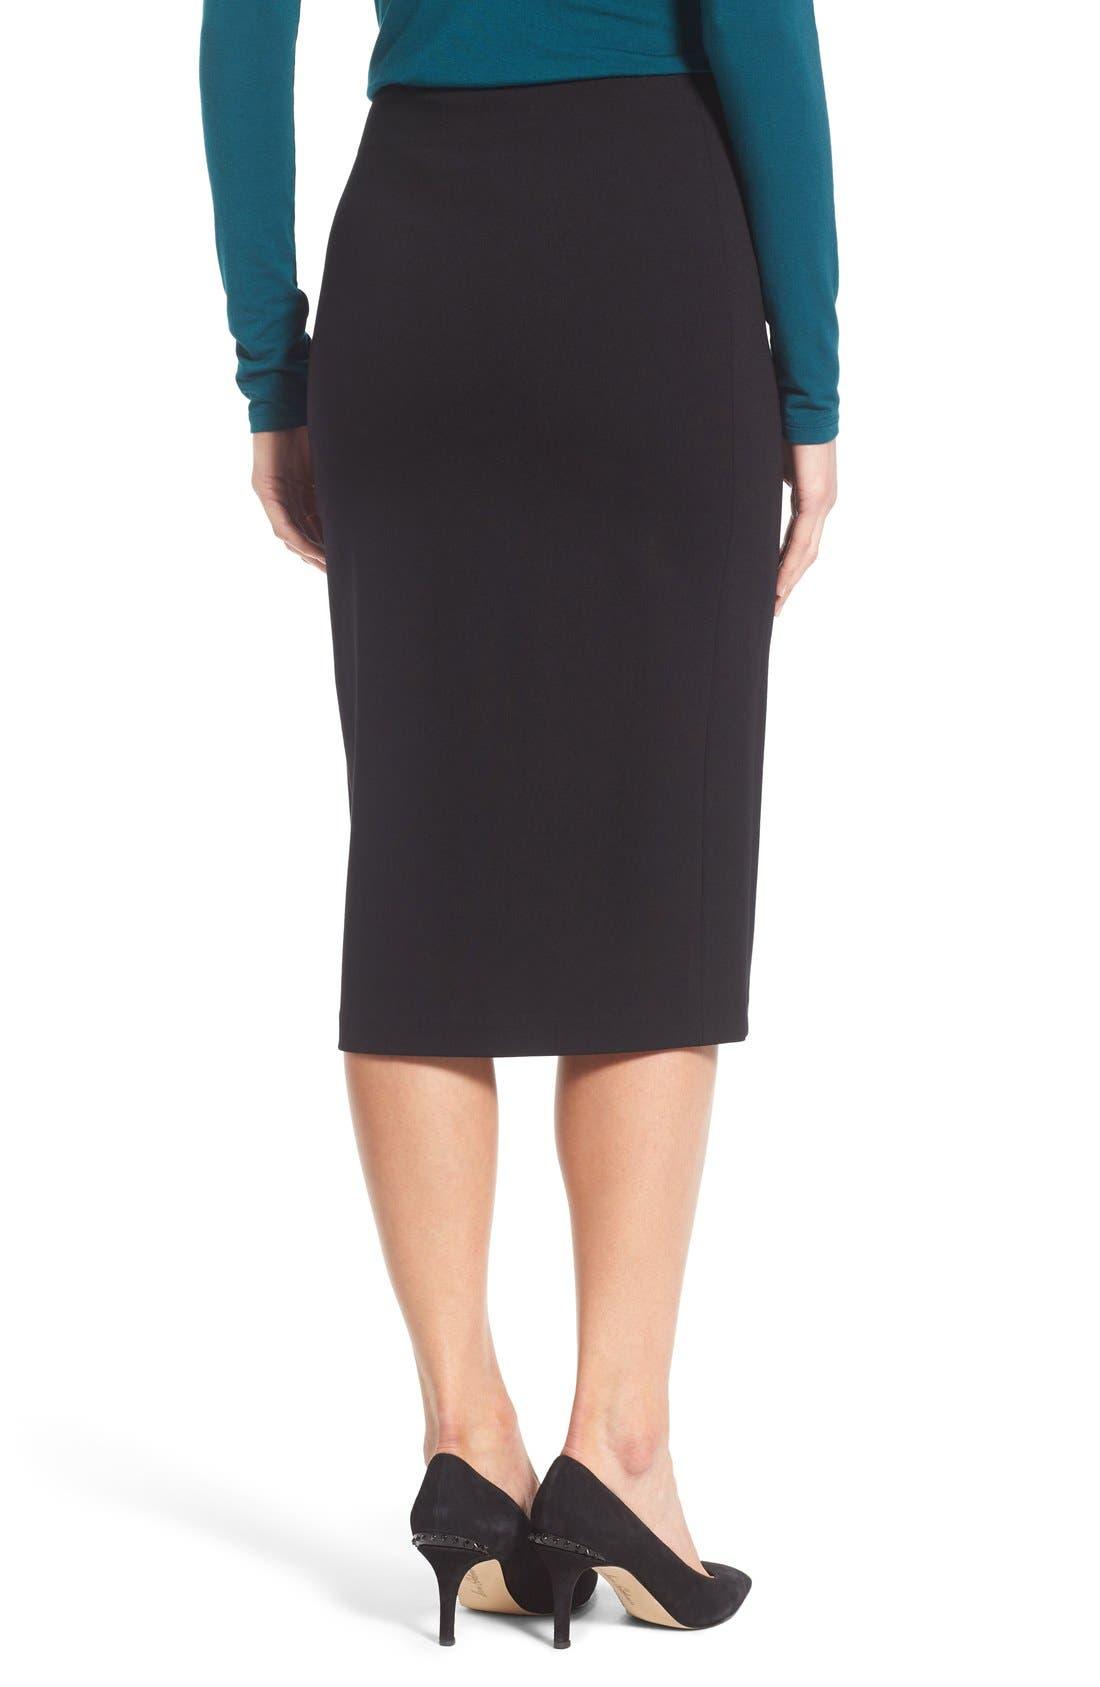 VINCE CAMUTO, Ponte Midi Skirt, Alternate thumbnail 2, color, RICH BLACK